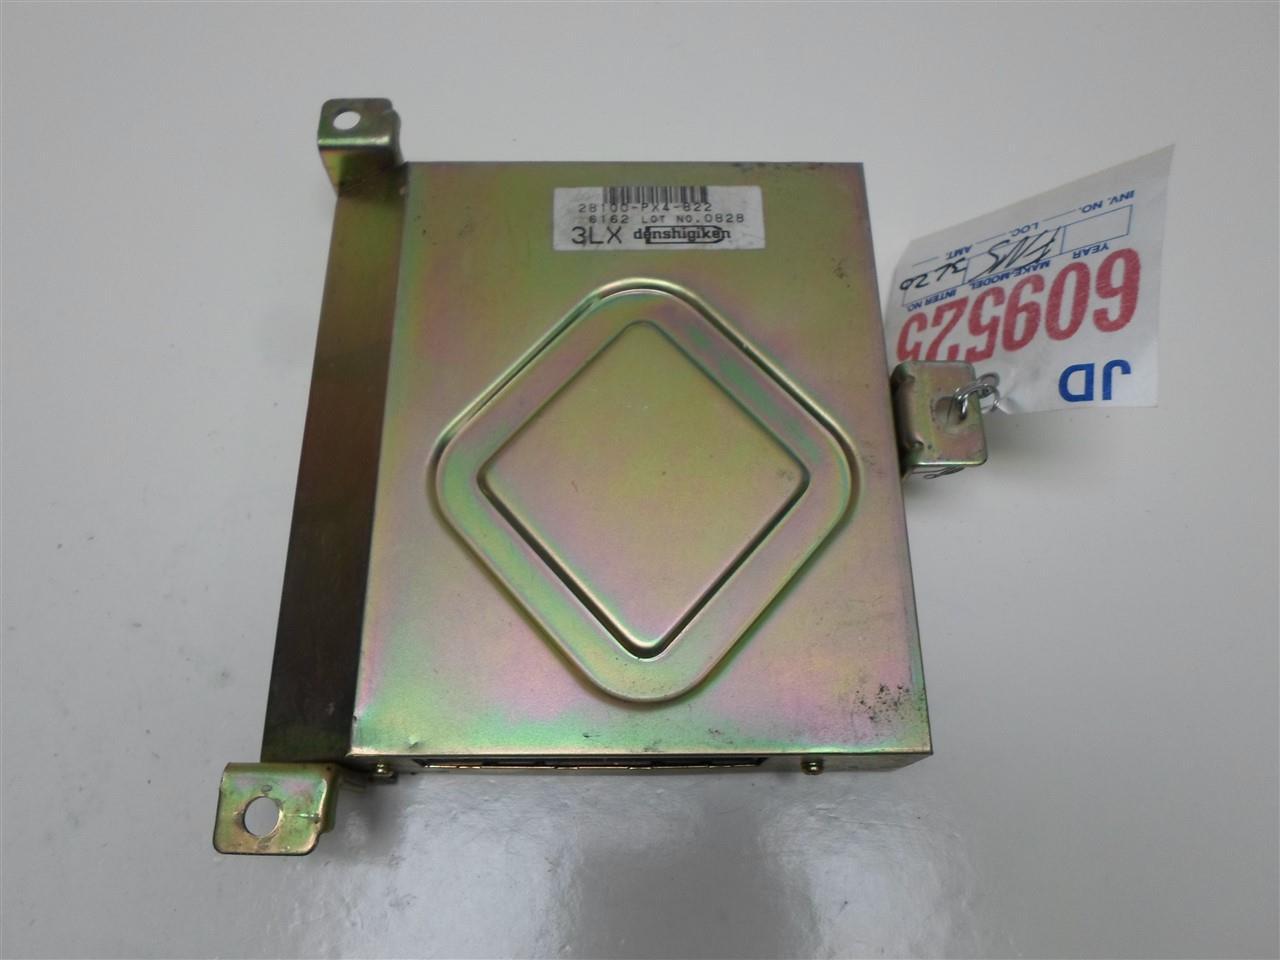 Details About Transmission Control Module Honda Accord 1990 1991 28100 Px4 822 Tcm Tcu Oem